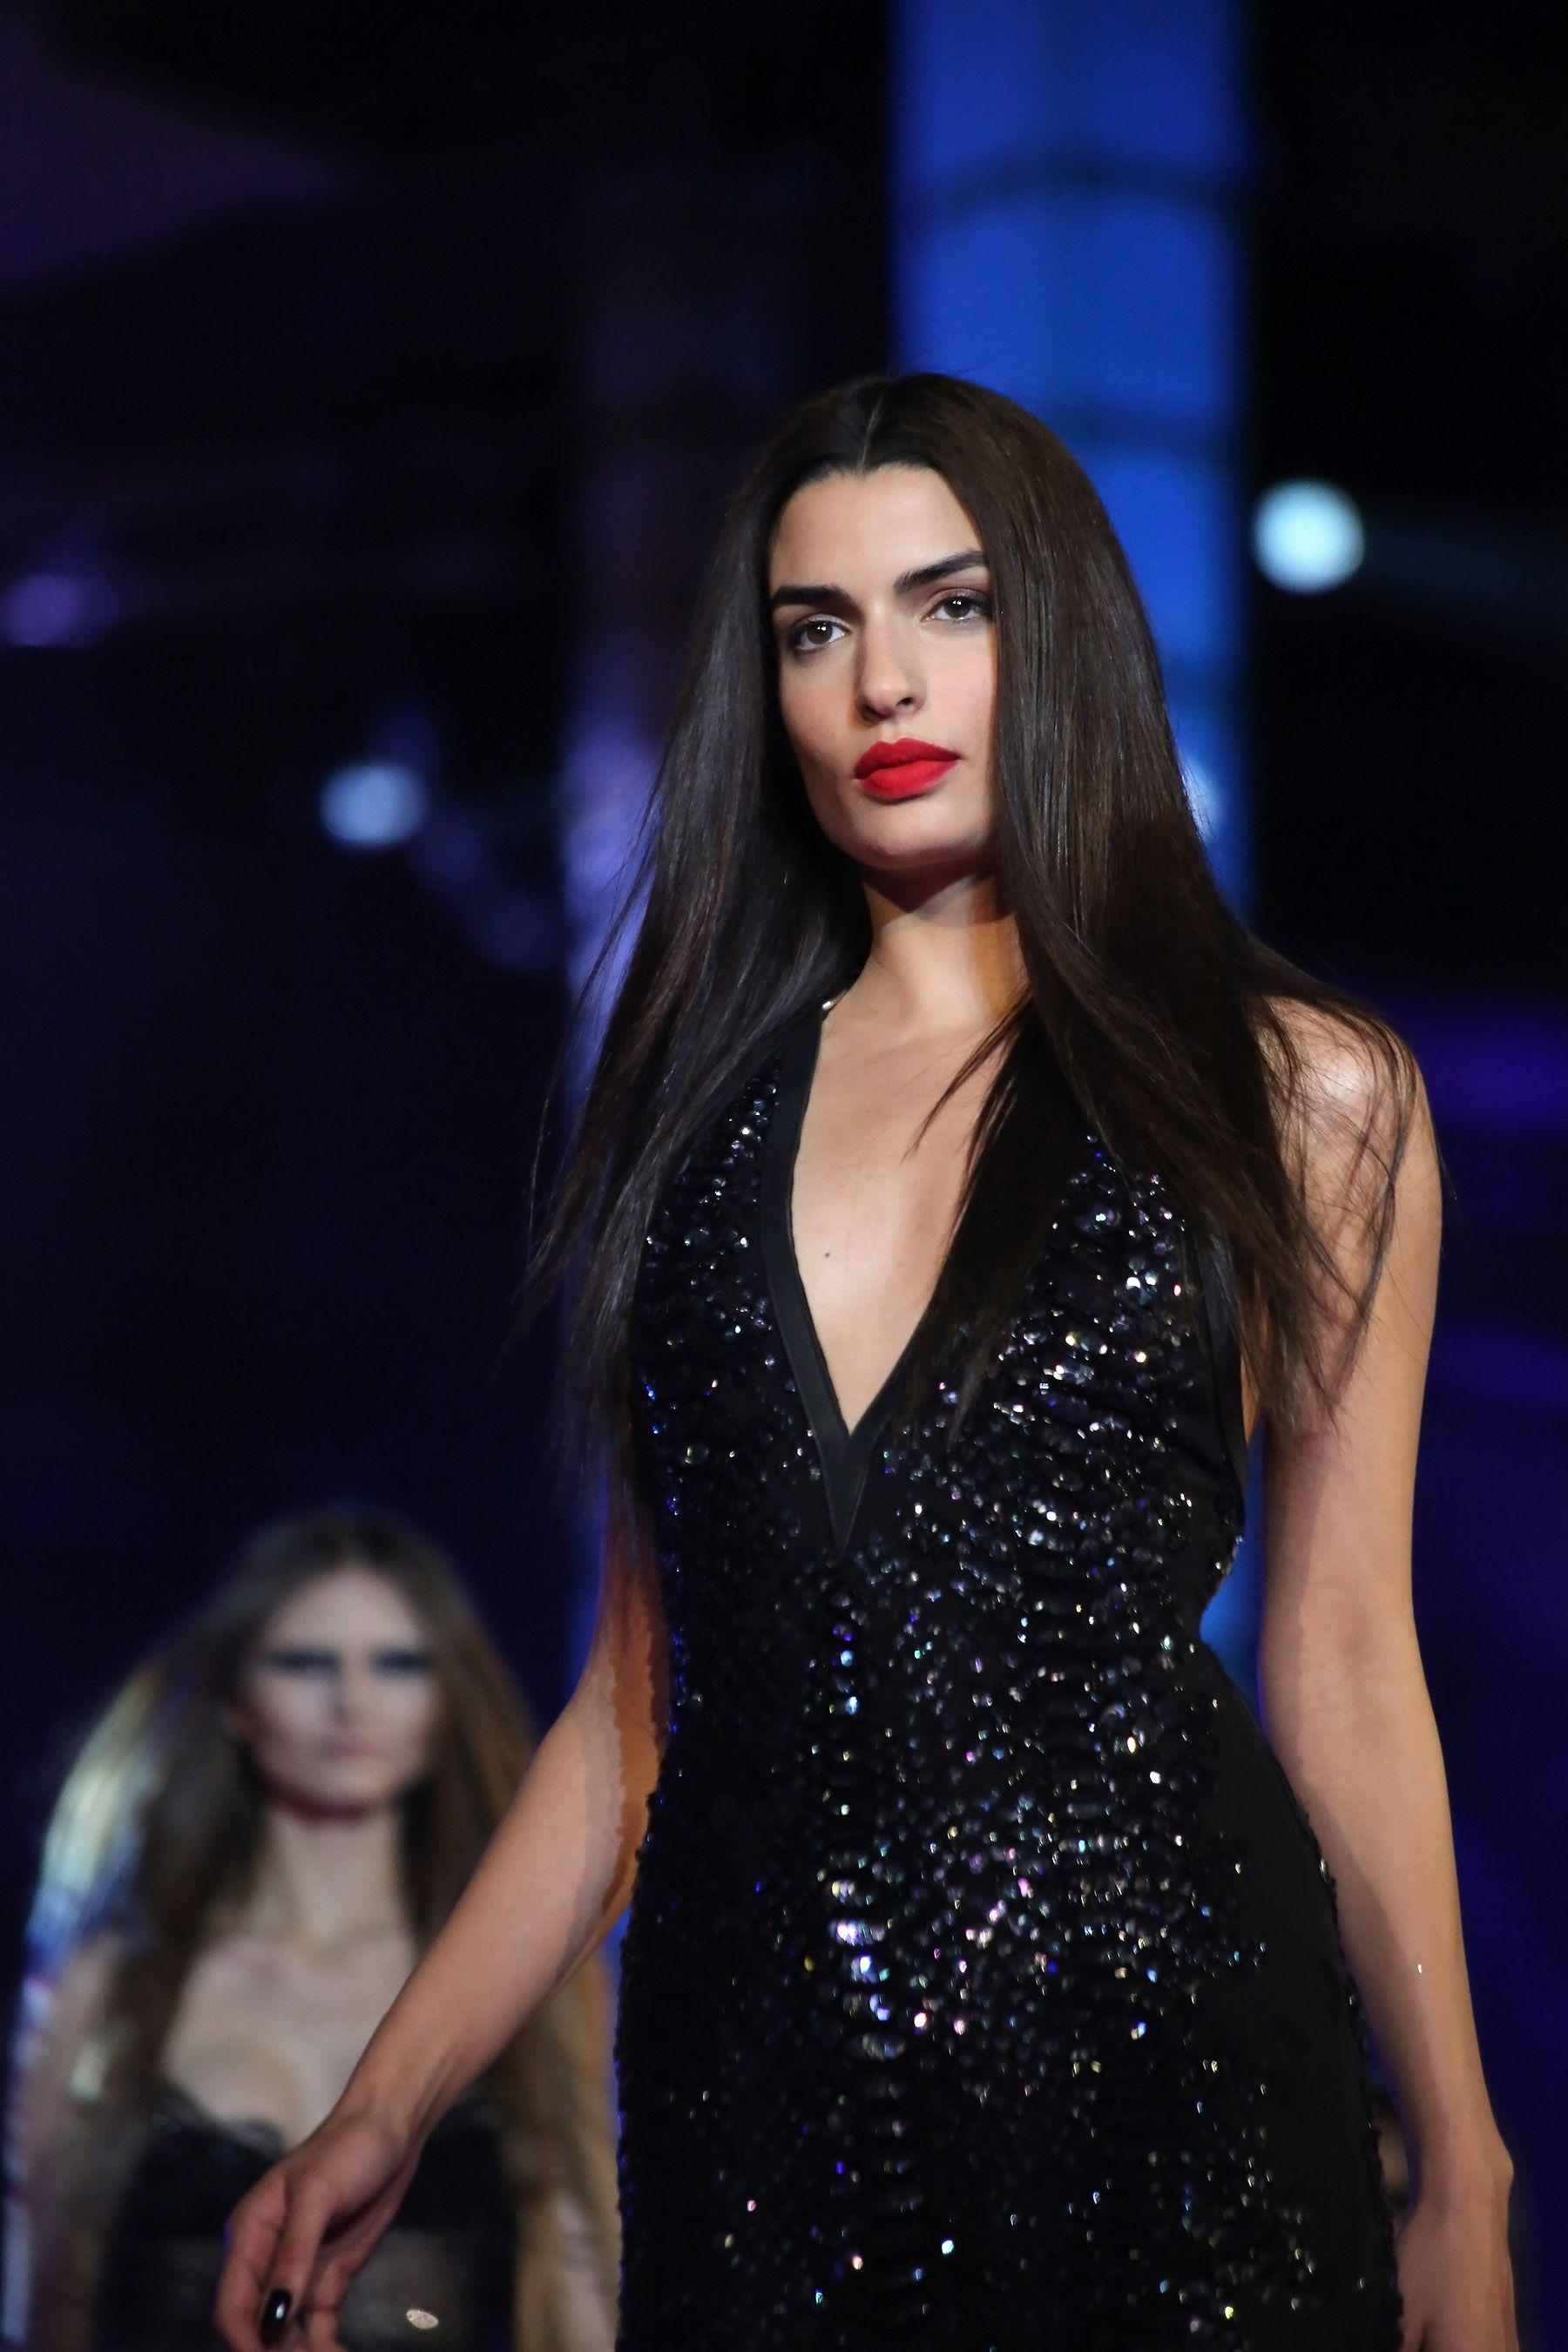 Hot Tonia Sotiropoulou nudes (11 images), Hot